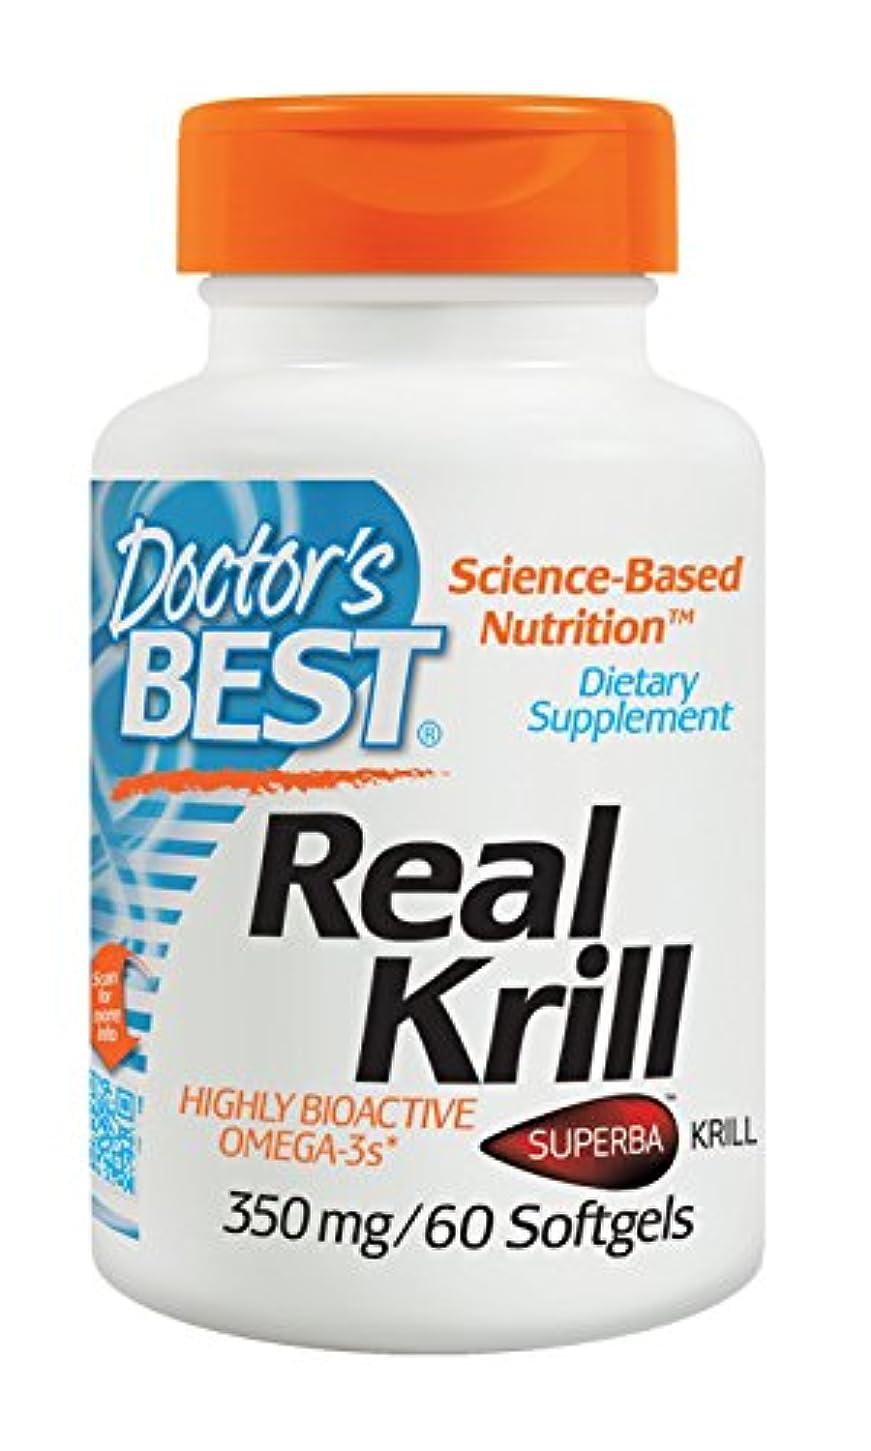 突然の約環境保護主義者海外直送品 Doctors Best Real Krill, 60 sofgels